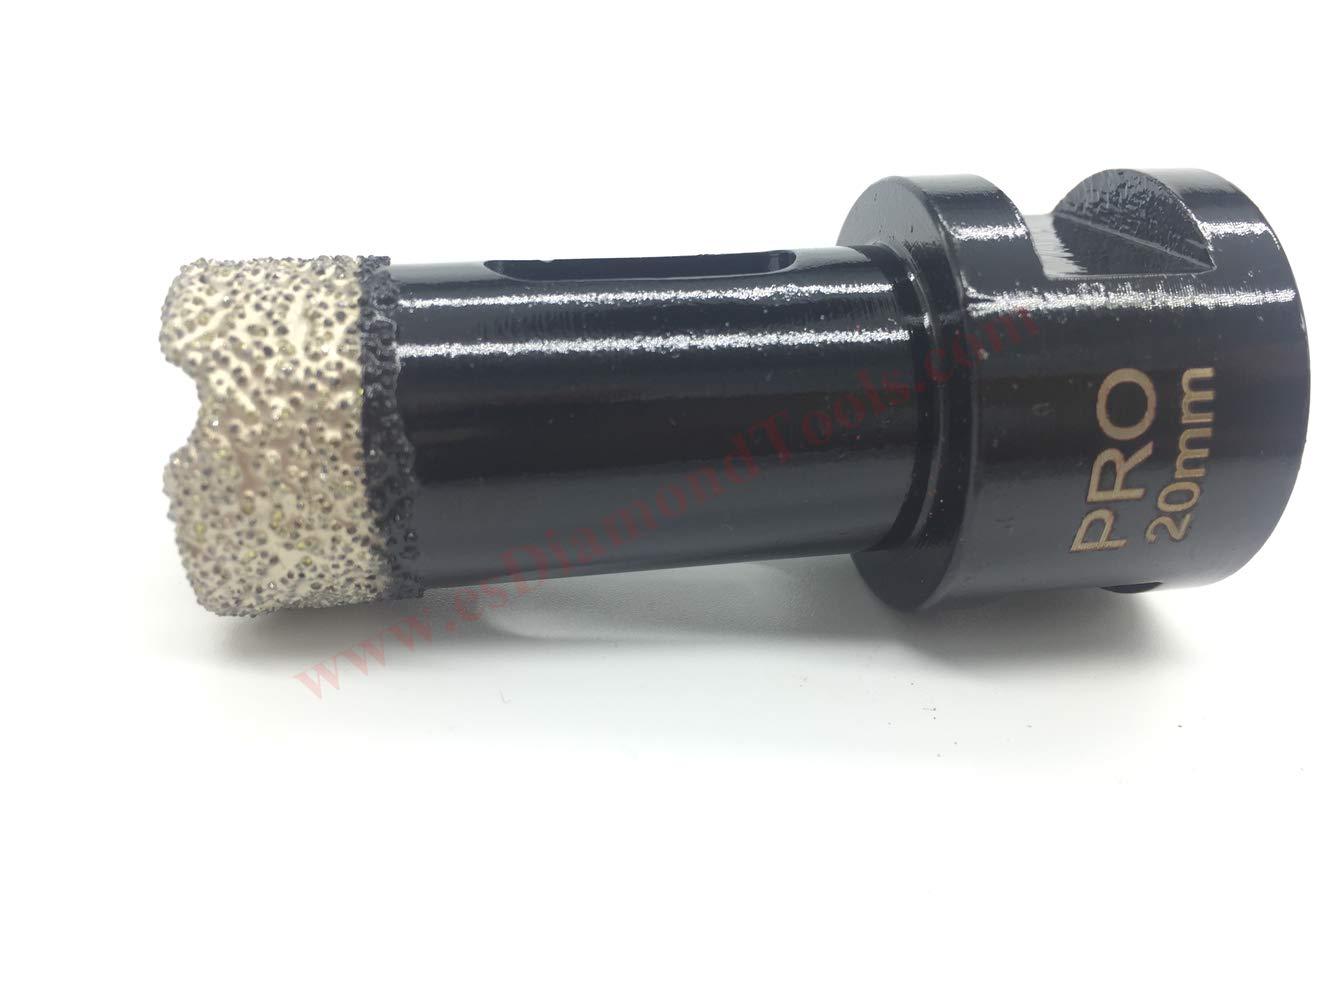 Para amoladora angular M14 perforaci/ón en seco en porcelana no necesita agua azulejos EASTAR brocas de diamante en seco para amoladora angular granito m/ármol Dia.8mm cer/ámica